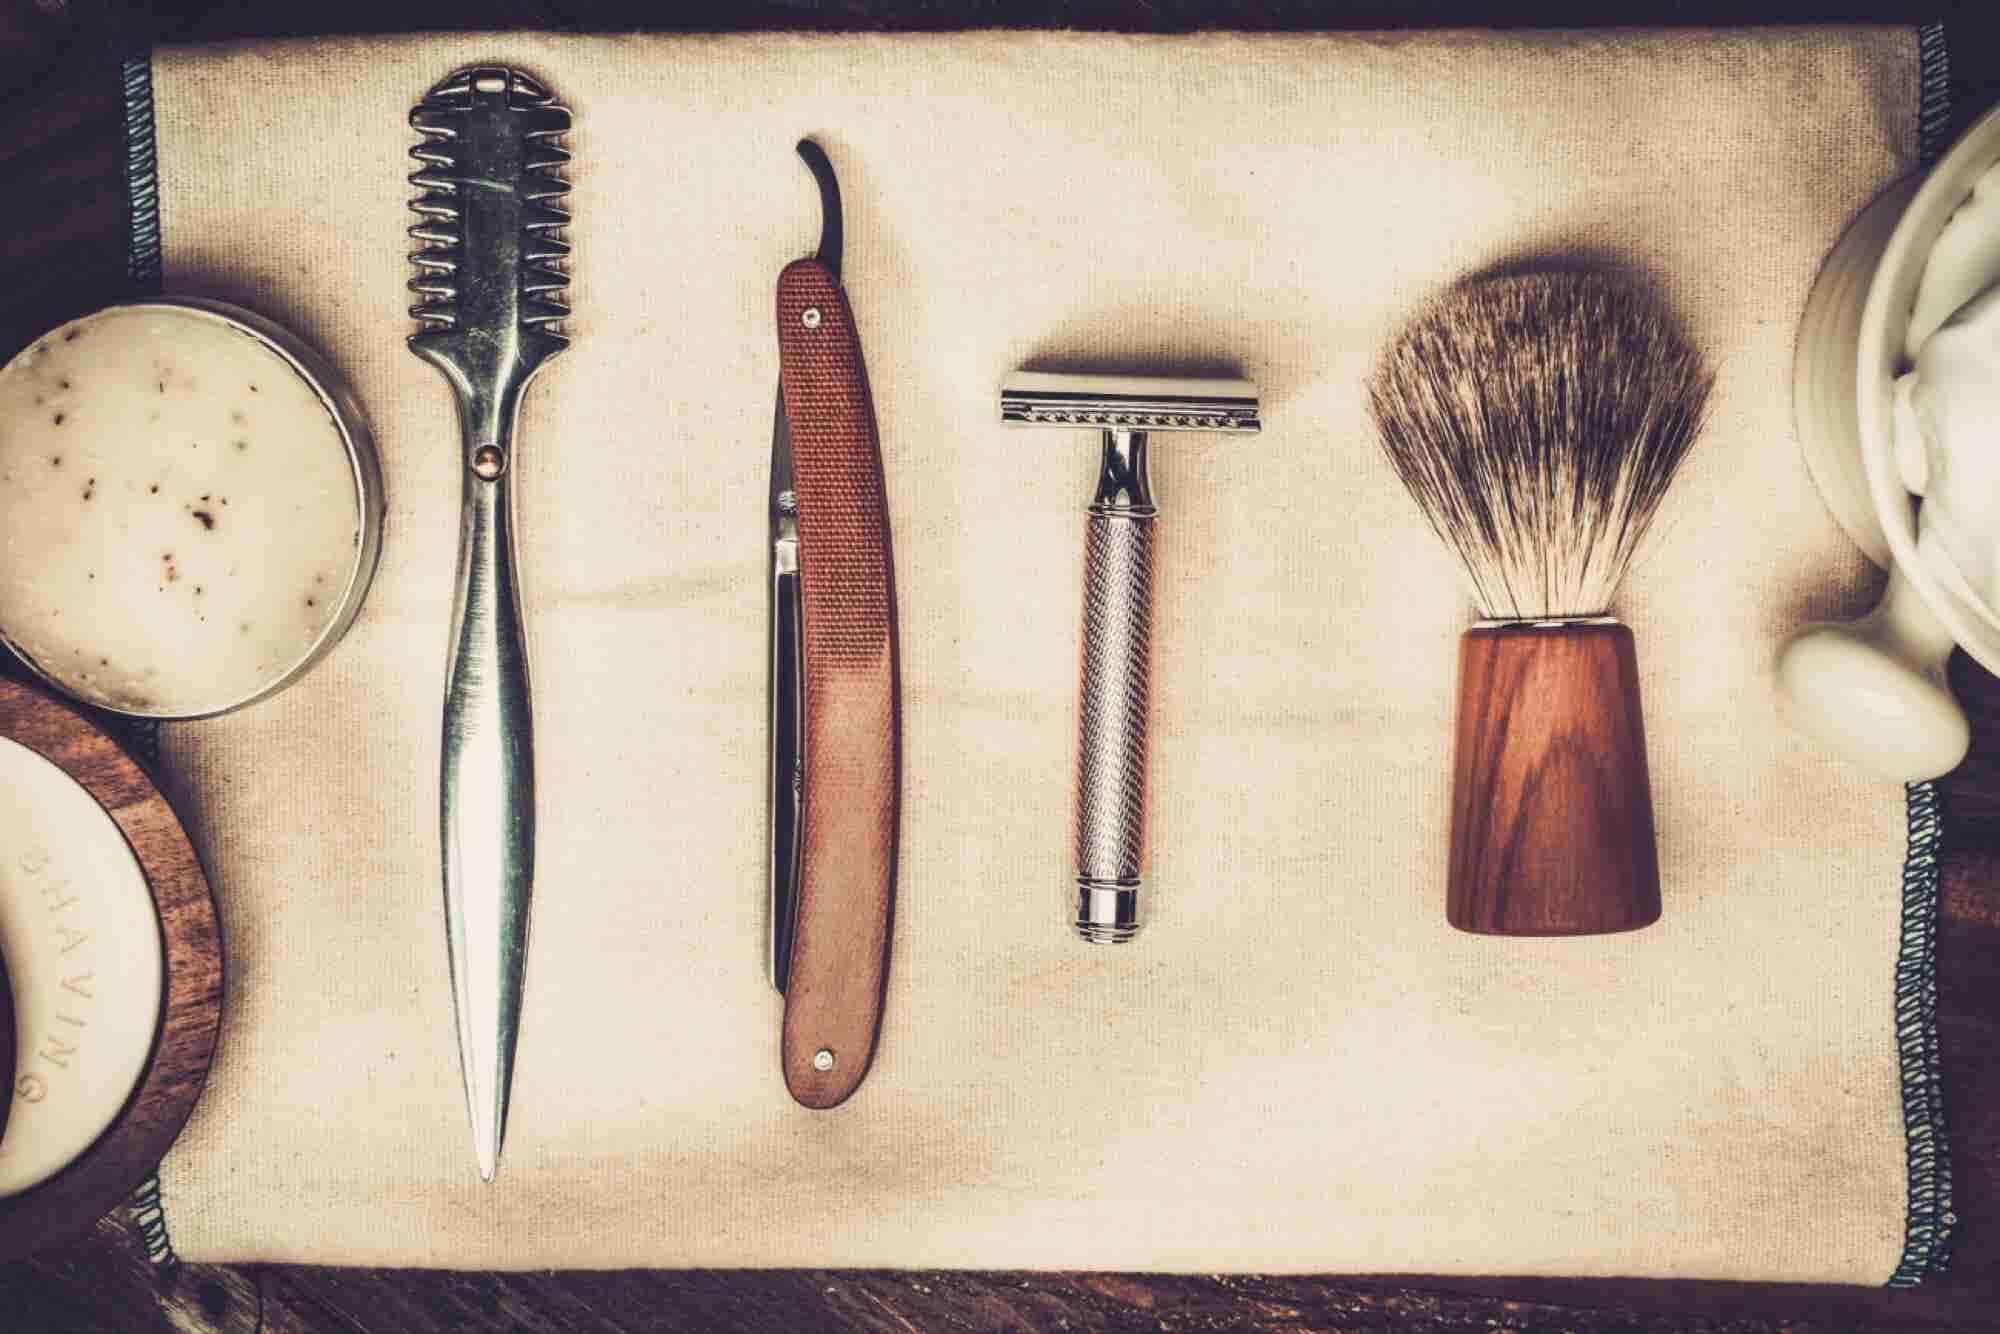 Men's Grooming - The Underdog of Beauty Industry